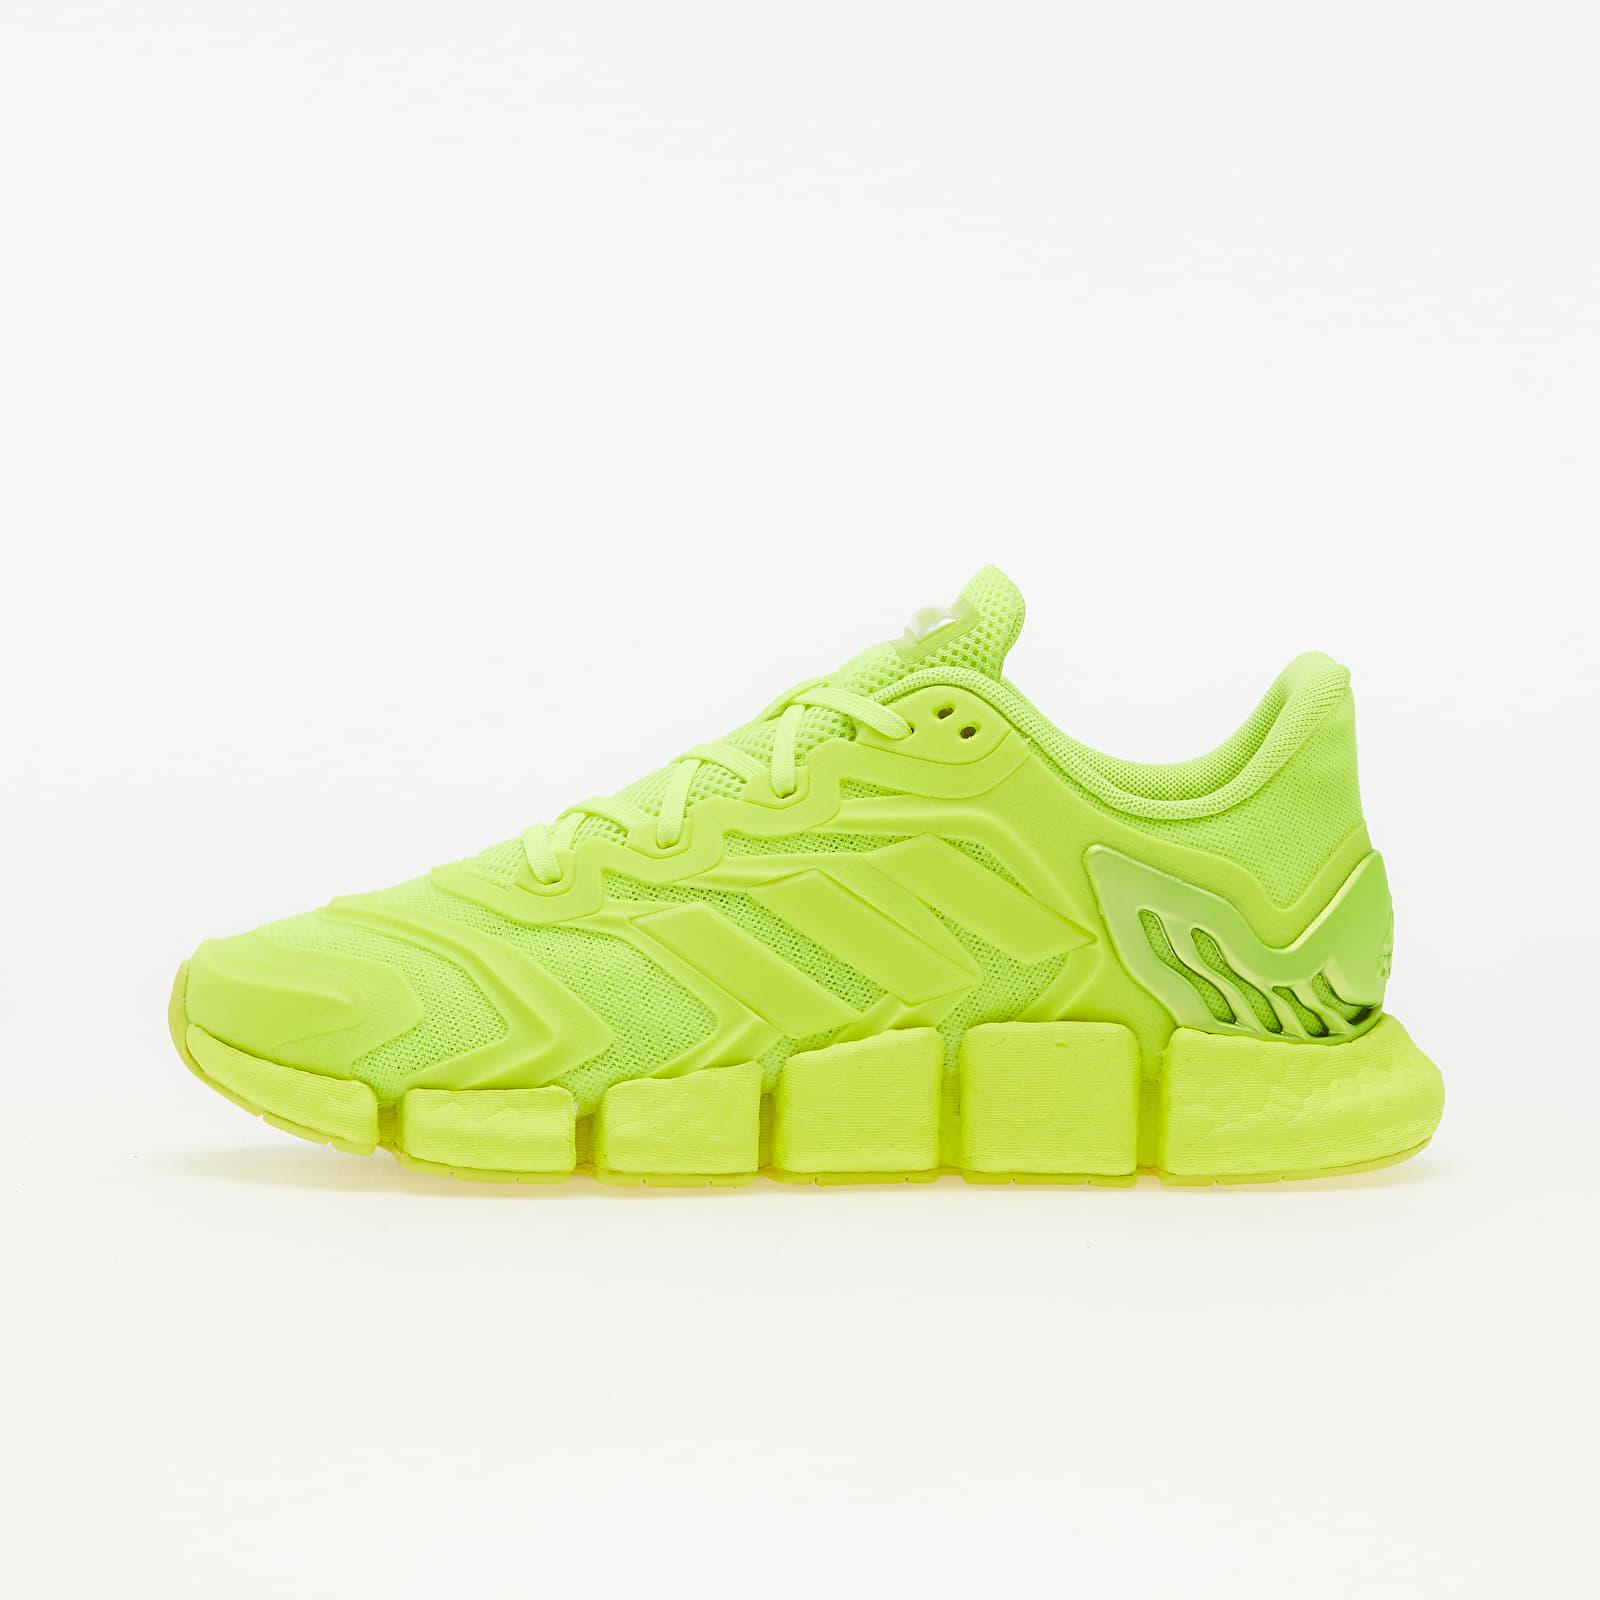 adidas Climacool Vento Solar Yellow/ Solar Yellow/ Core Black FZ1717